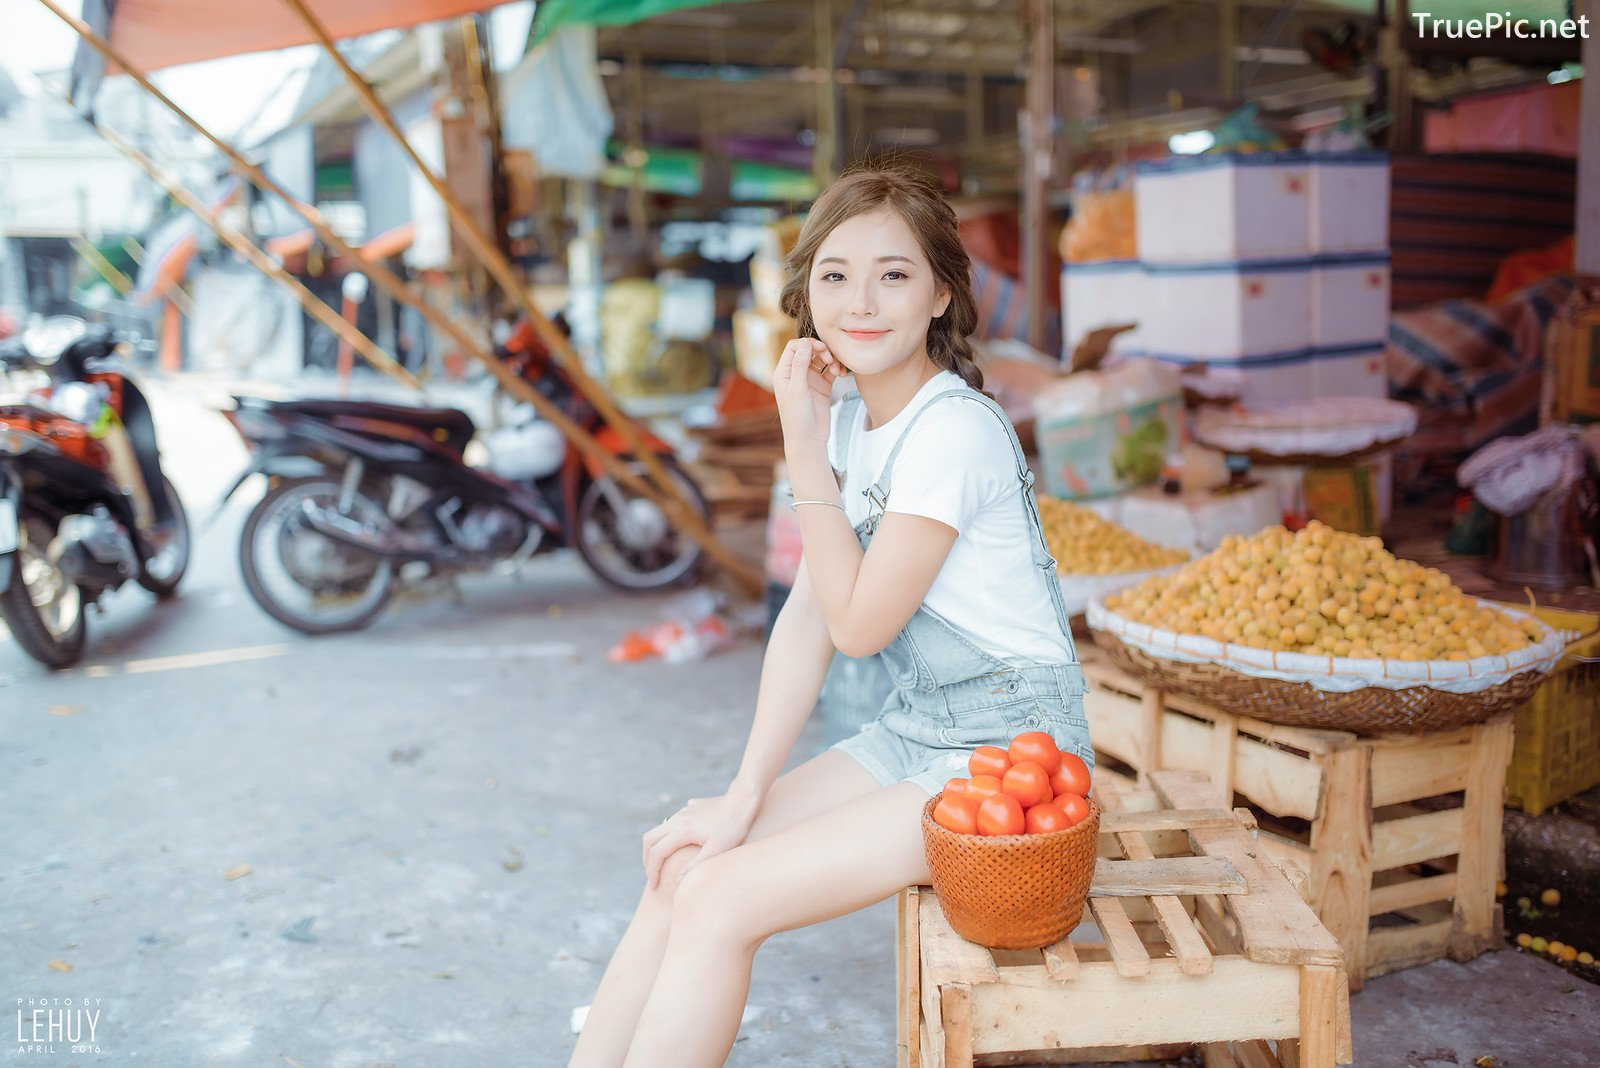 Image-Vietnamese-Hot-Girl-Photo-Album-Tomato-Little-Girl-Cute-TruePic.net- Picture-5